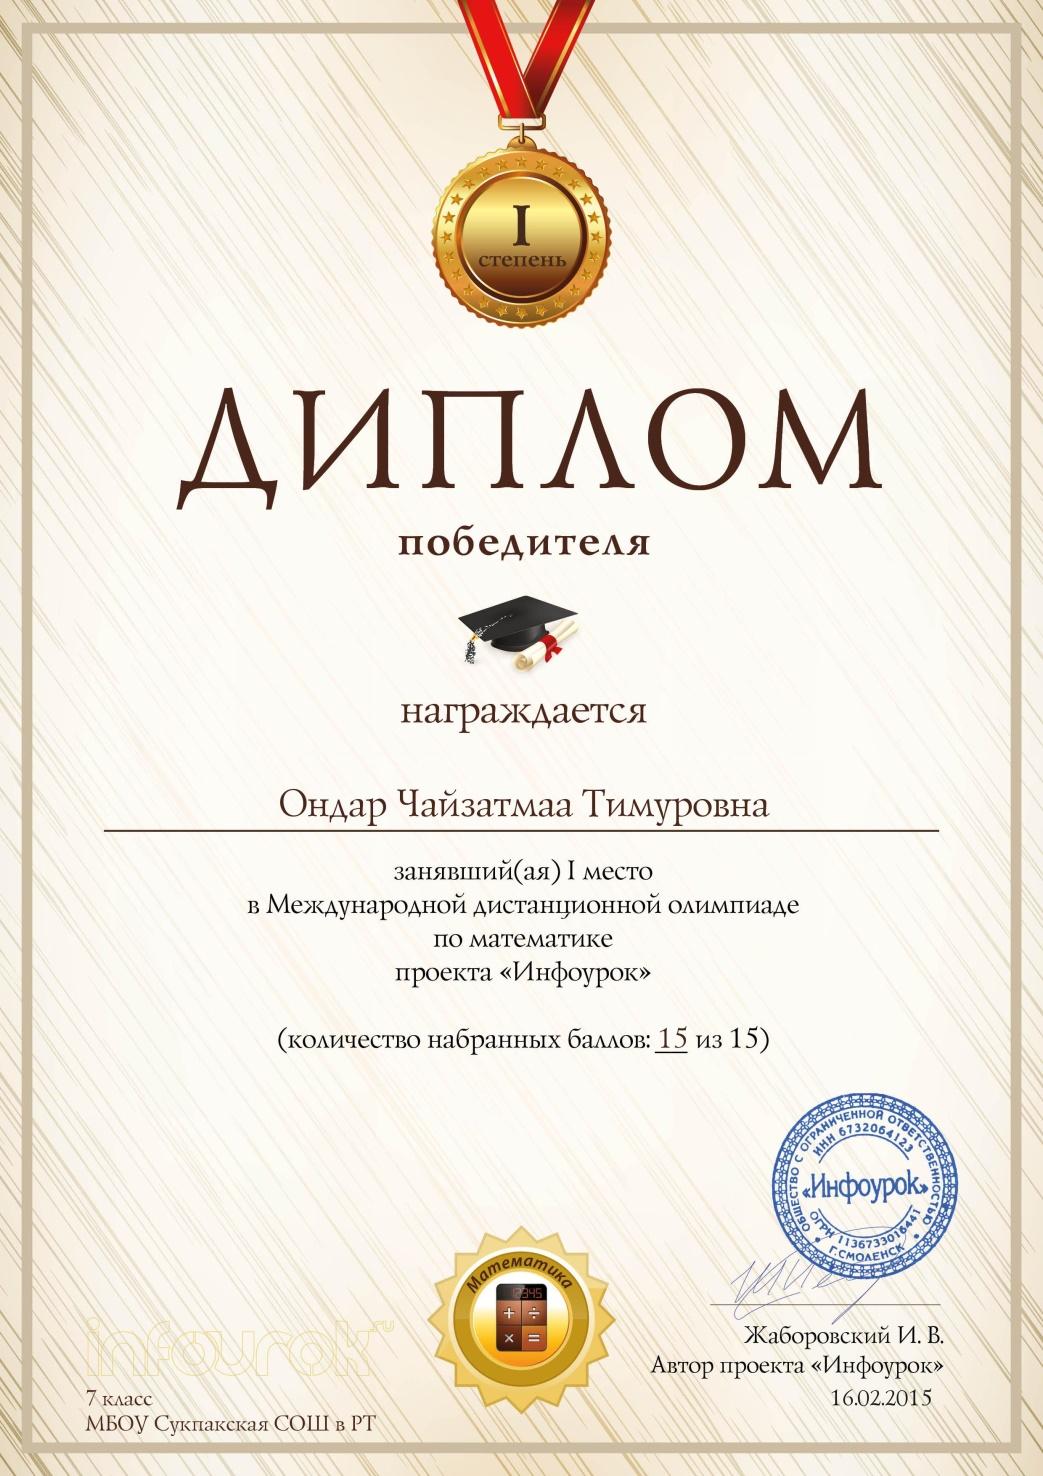 C:\Users\Снежана\Desktop\сертификаты инфоурок\олимпиада результат\format_A5_document_337300.jpg